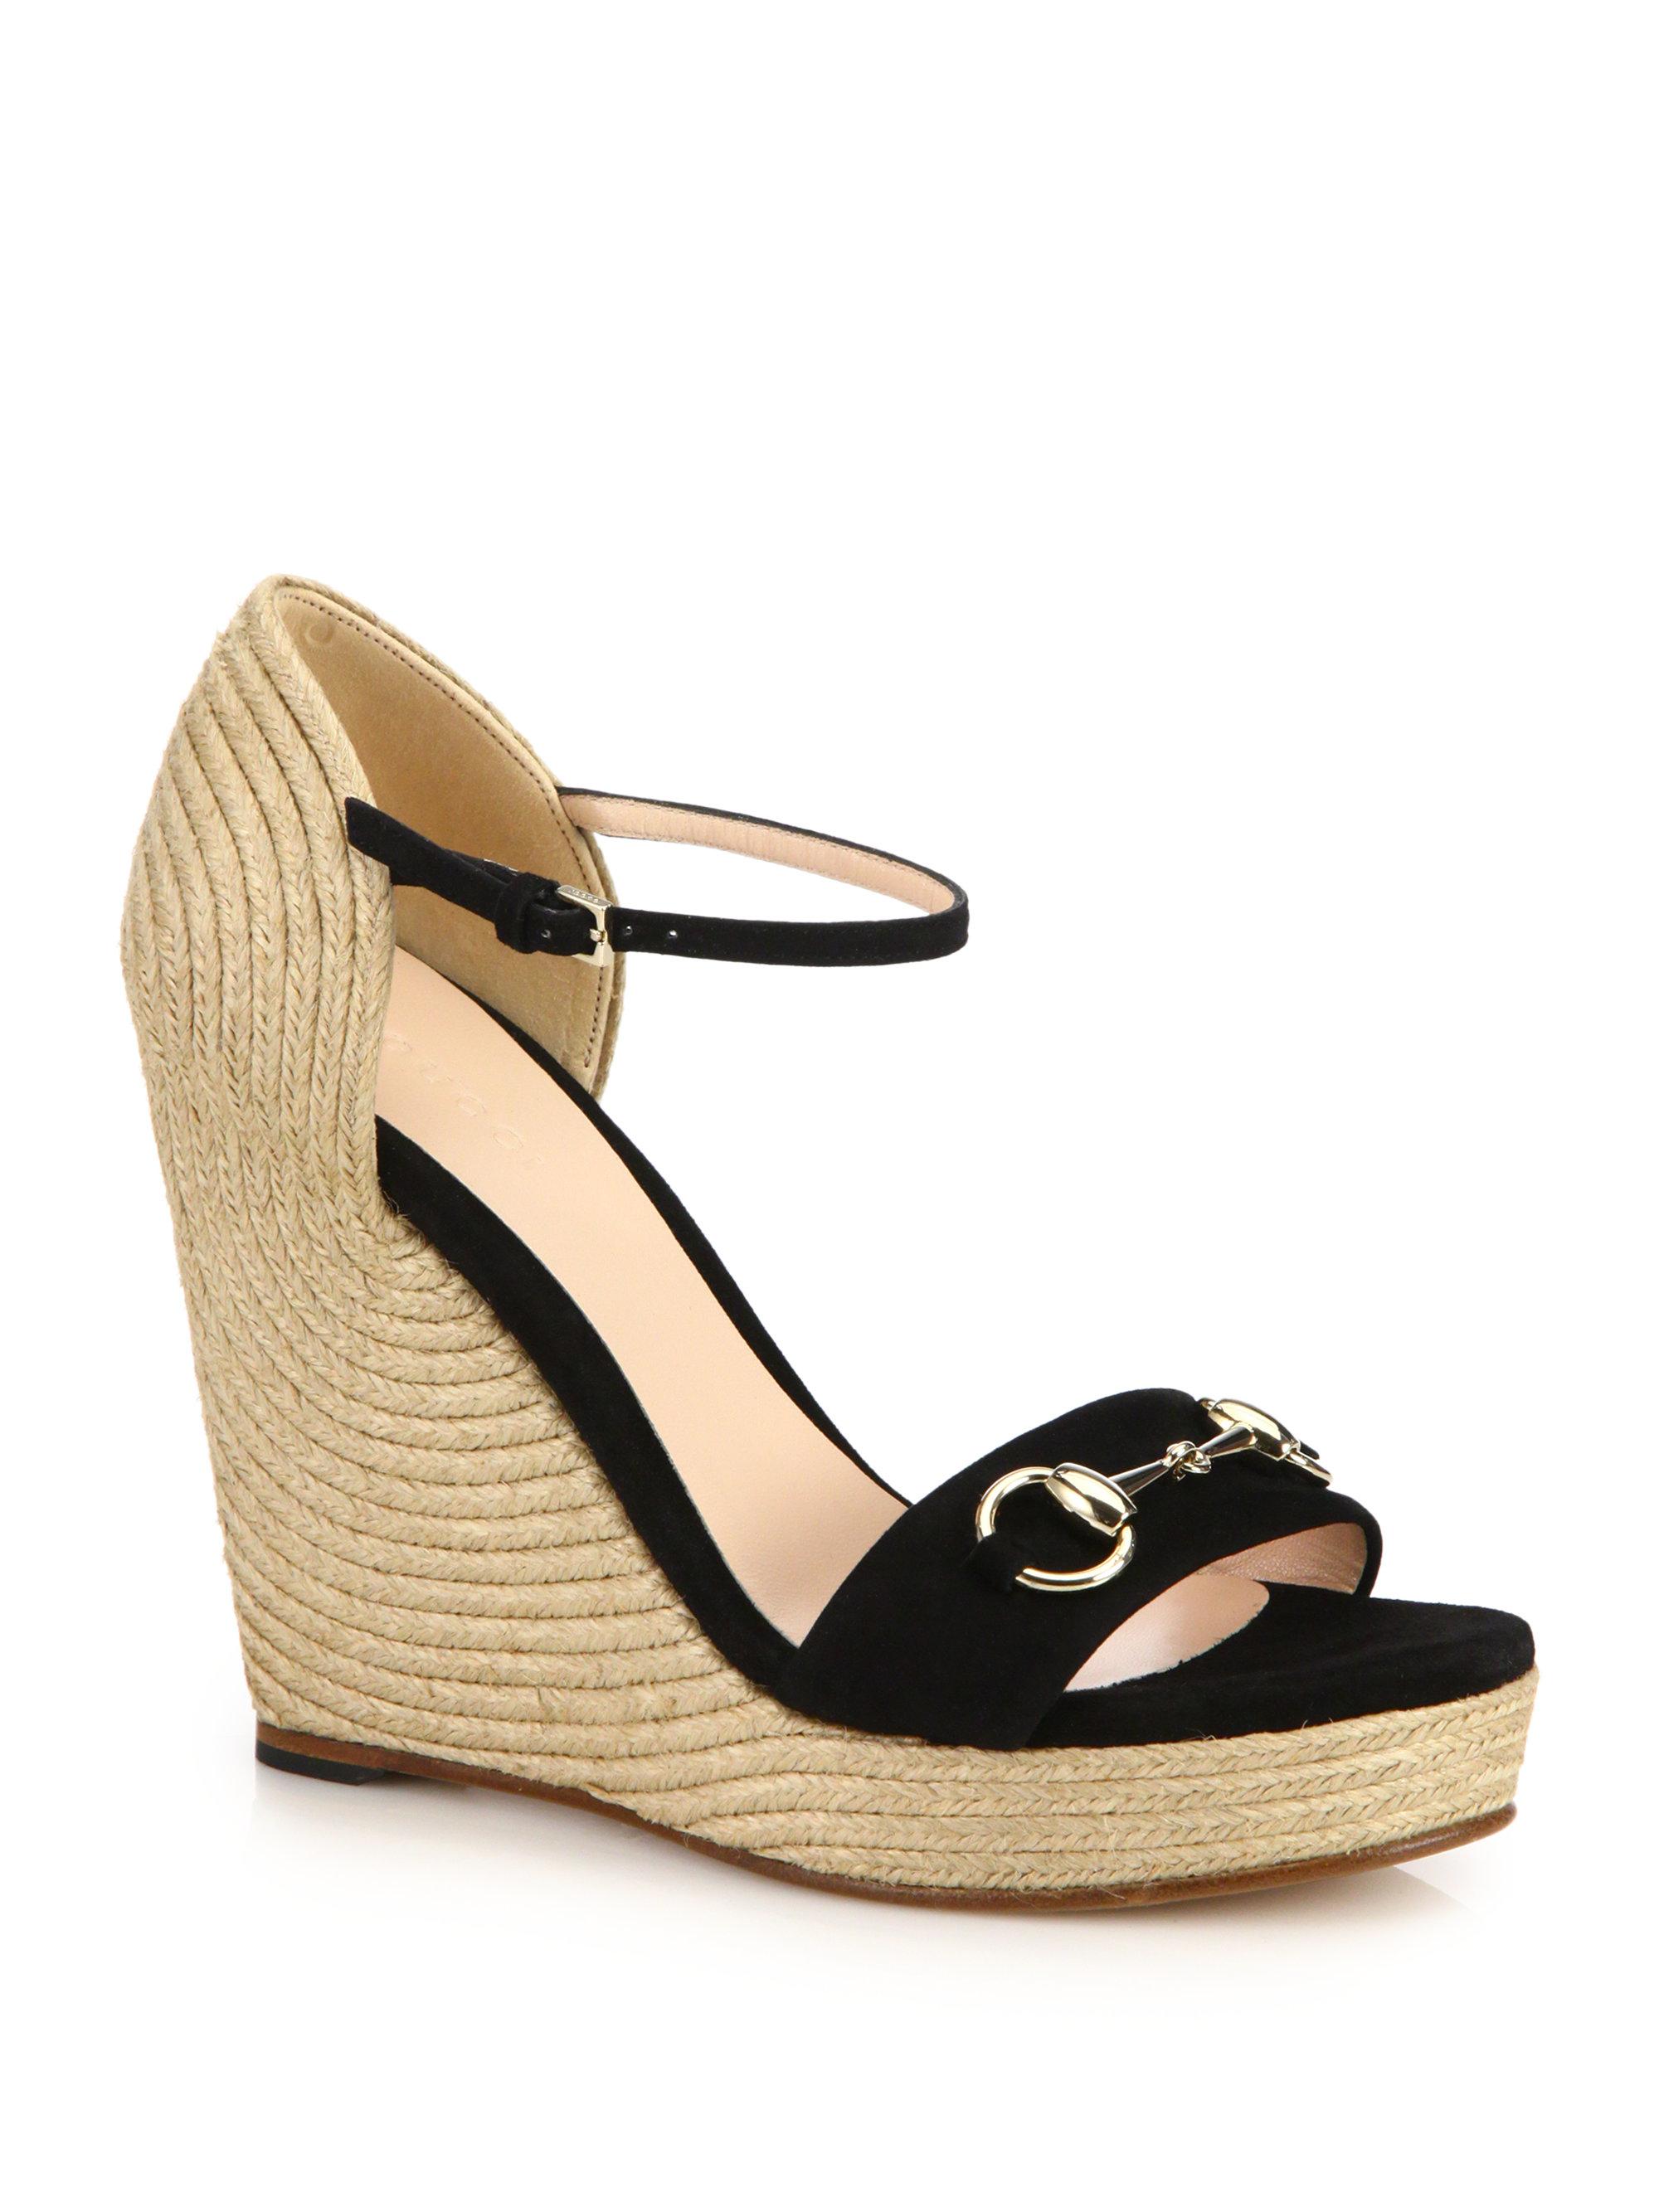 gucci horsebit detailed suede espadrille wedge sandals in